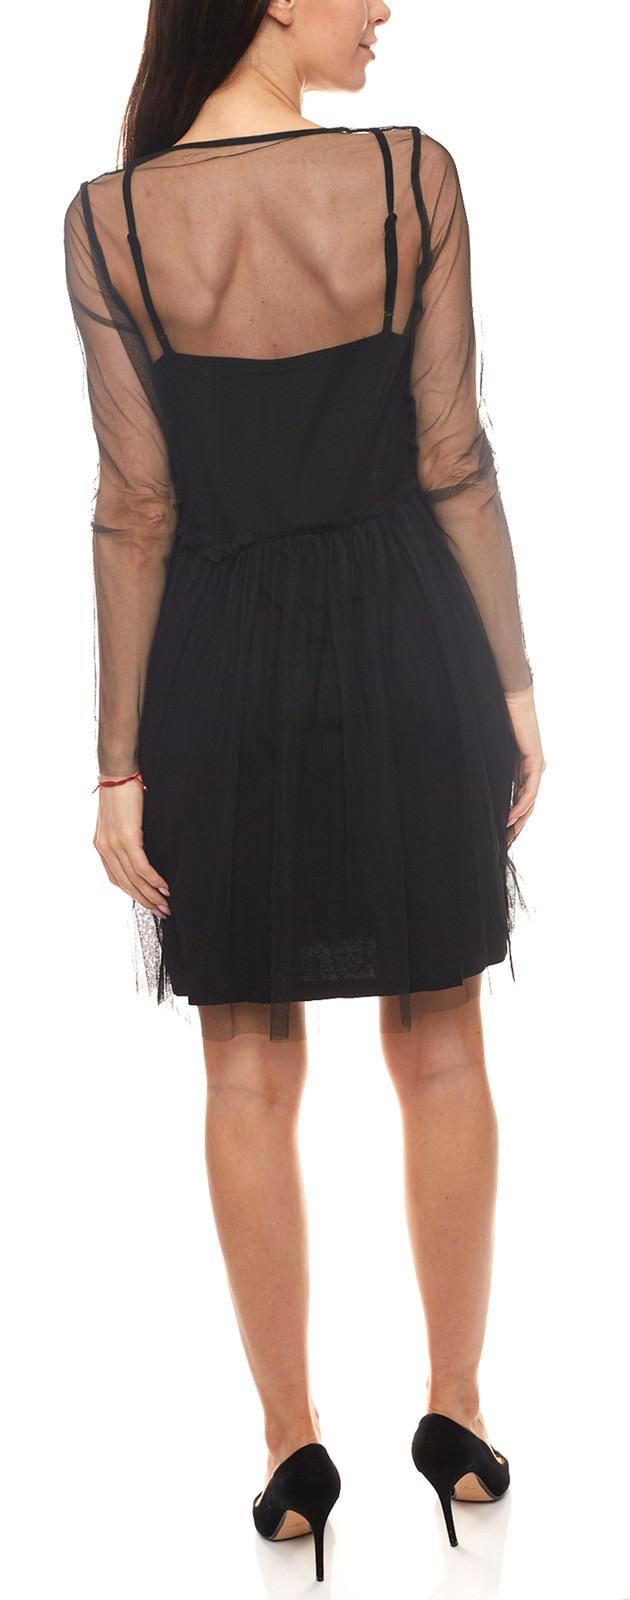 Minimum Minikleid Teilweise Transparentes Damen Kleid Im